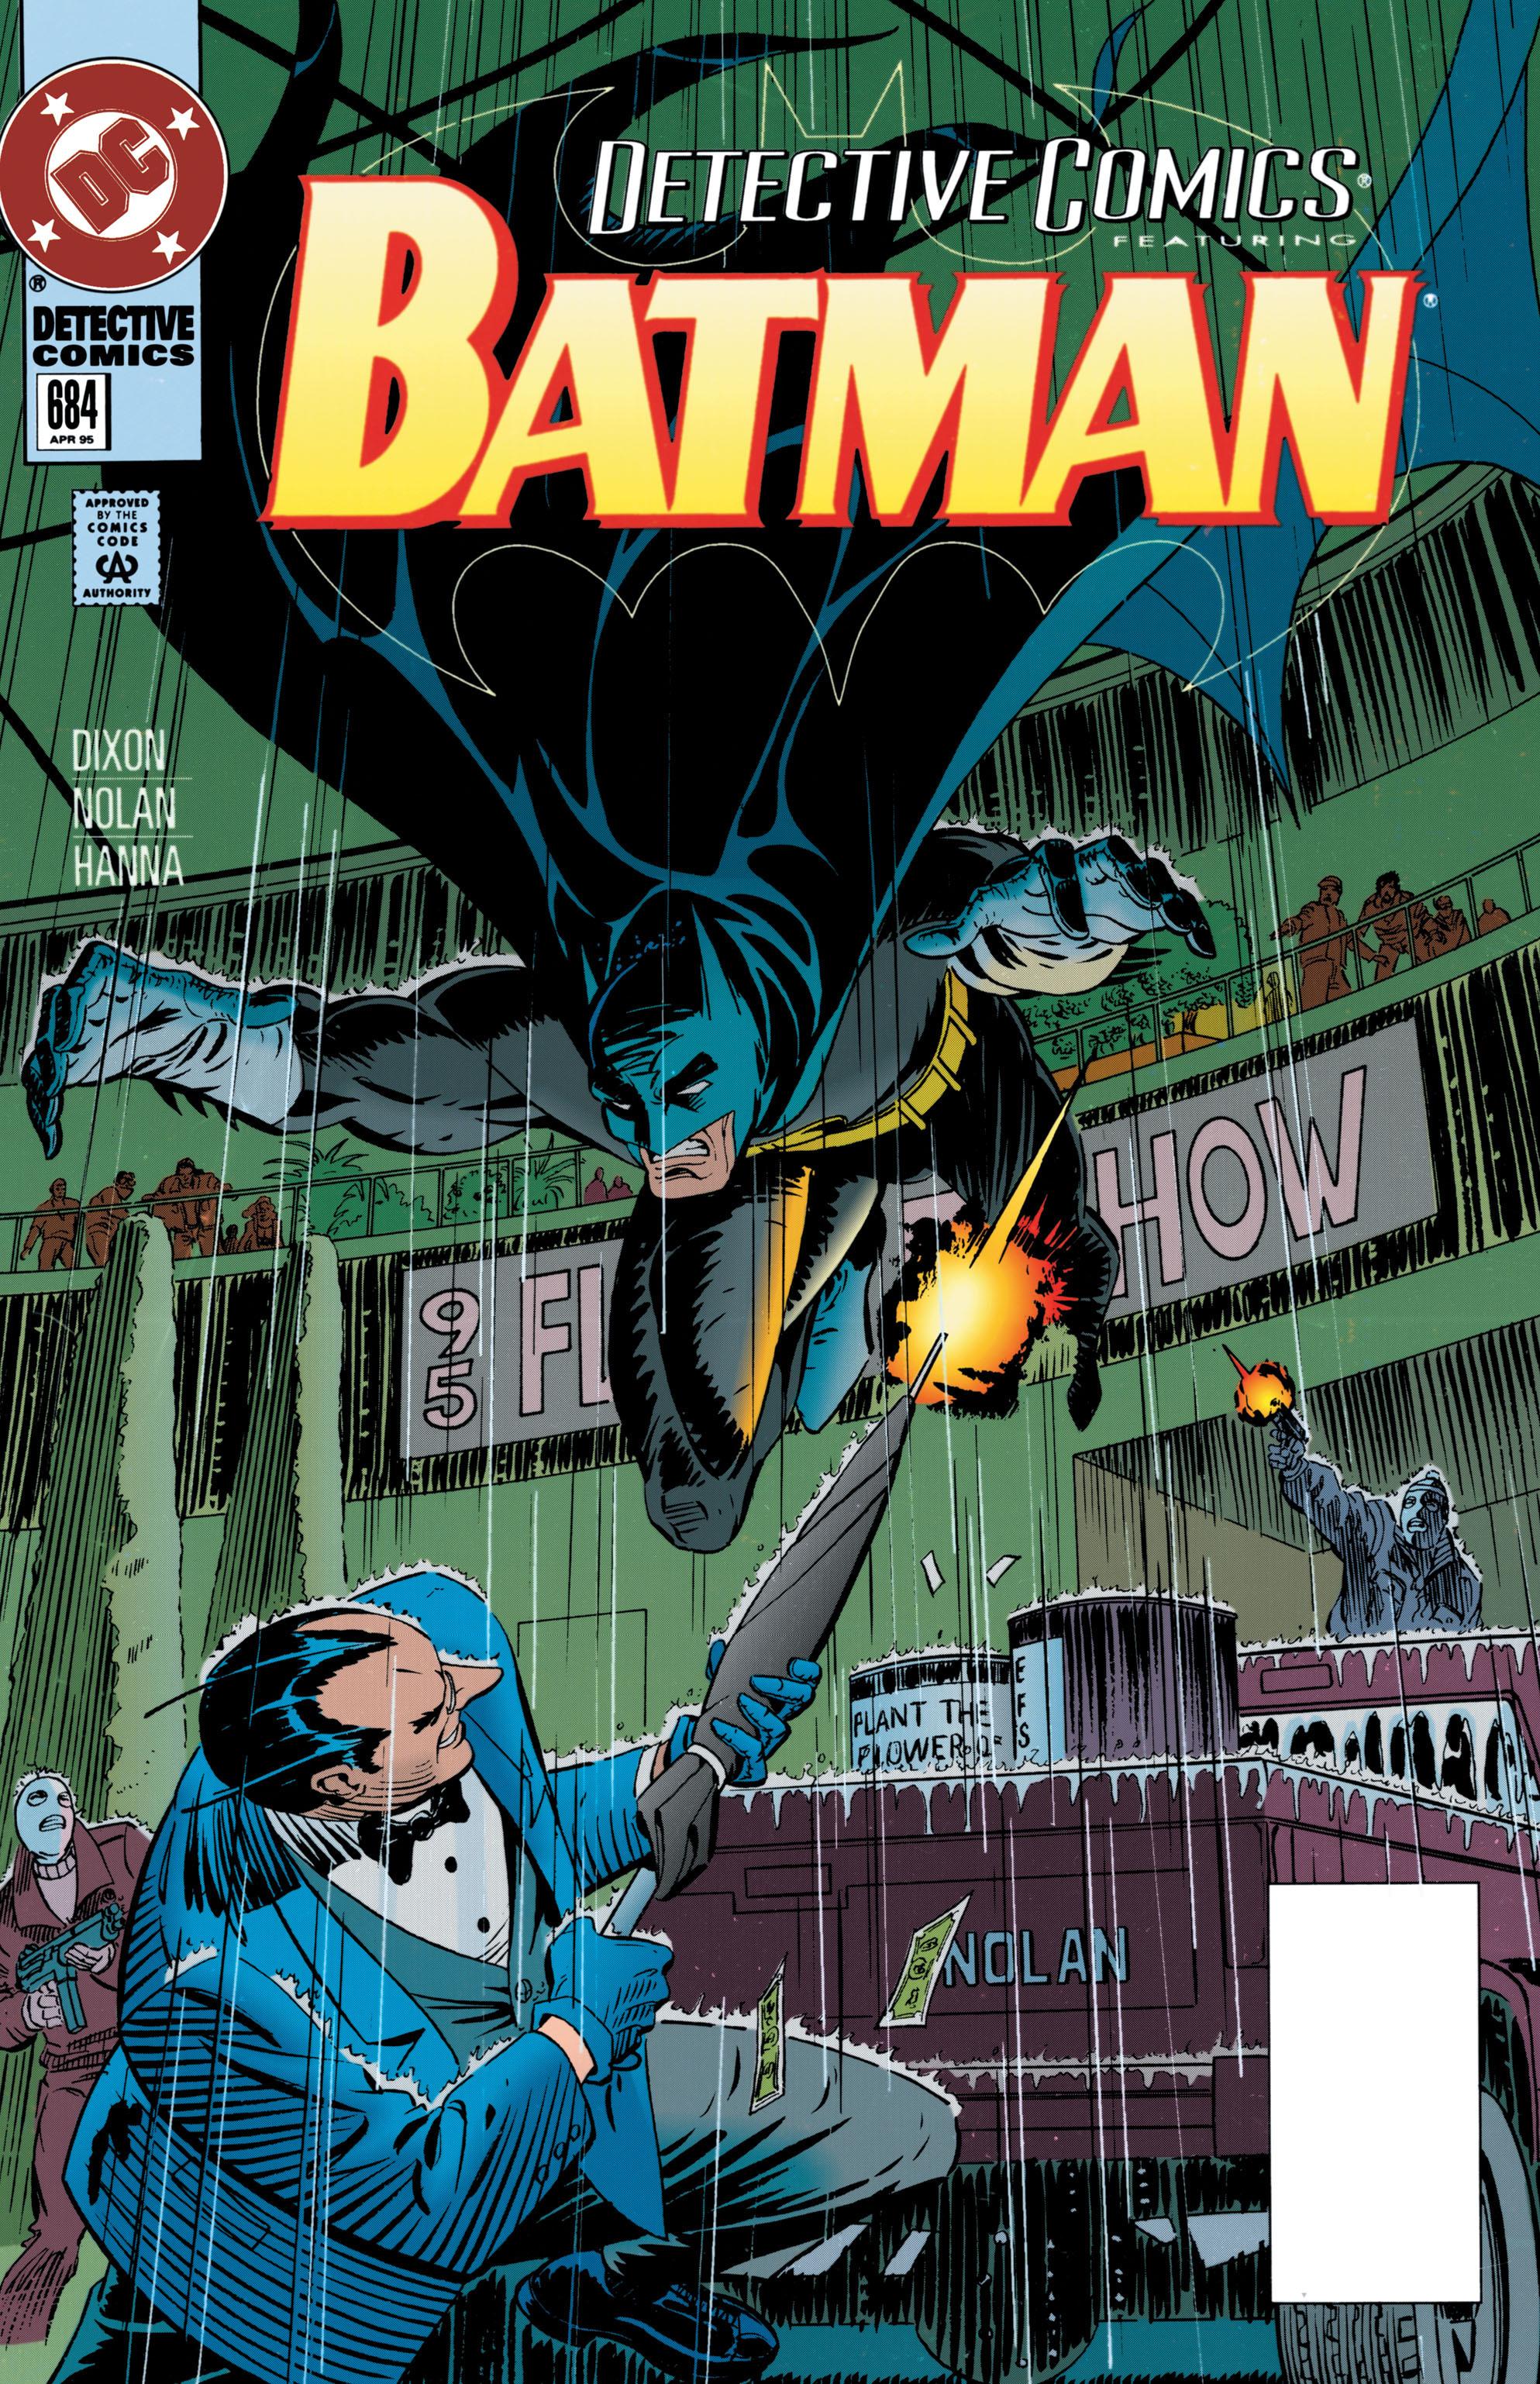 Detective Comics (1937) 684 Page 1